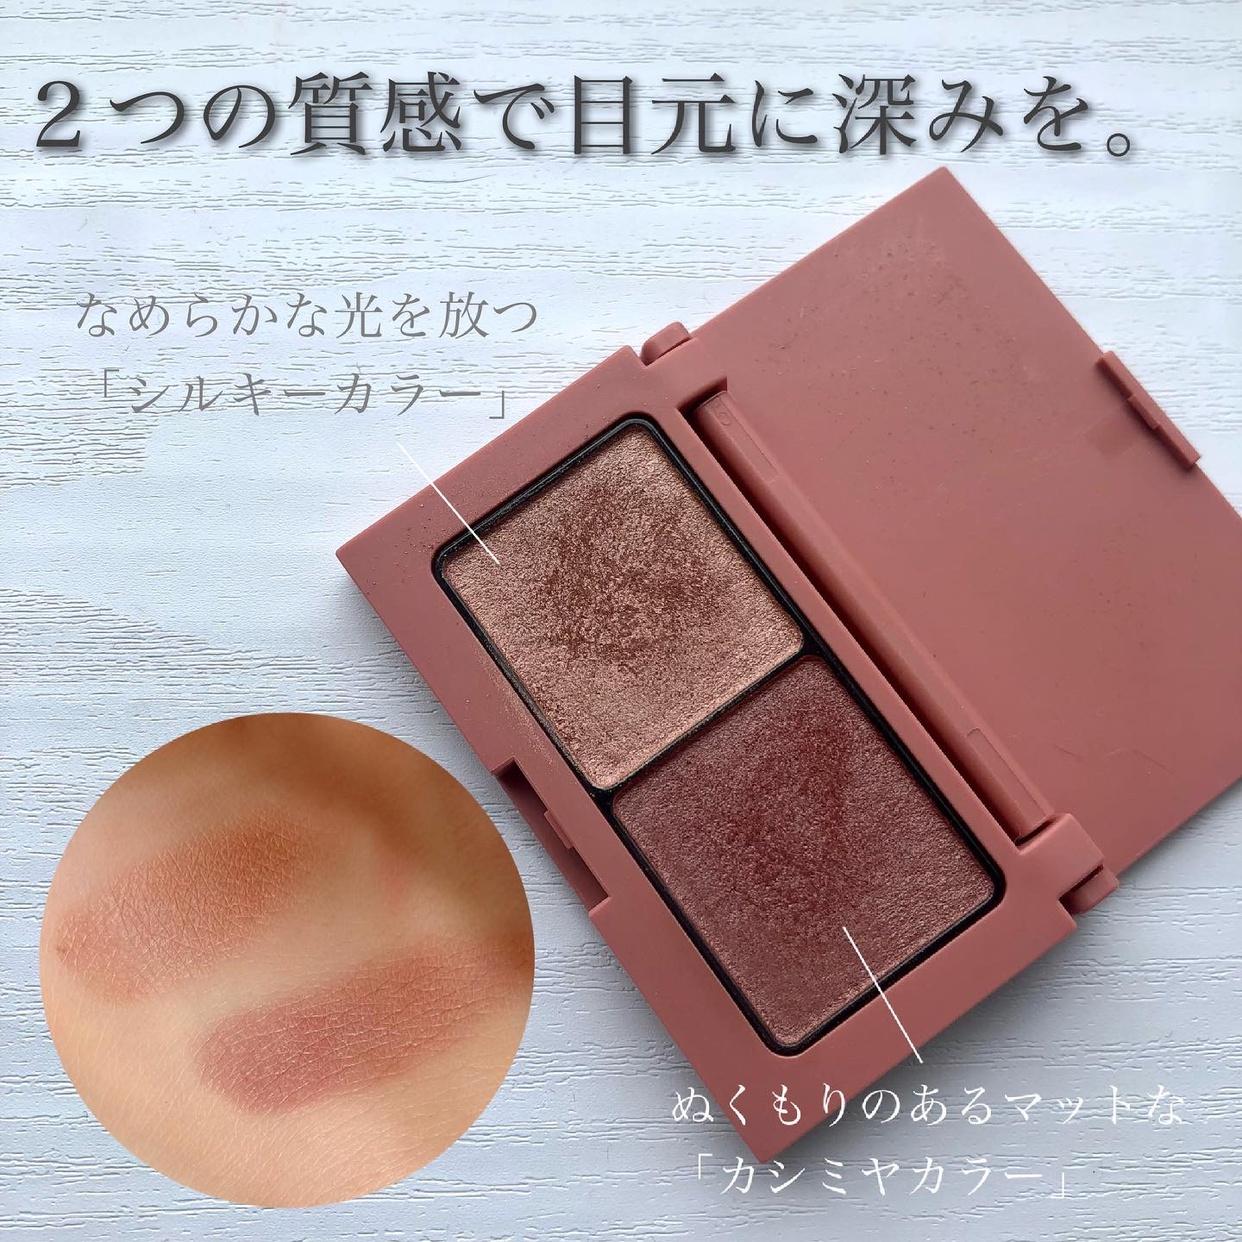 ettusais(エテュセ) アイエディション (カラーパレット)を使ったsachikoさんのクチコミ画像2